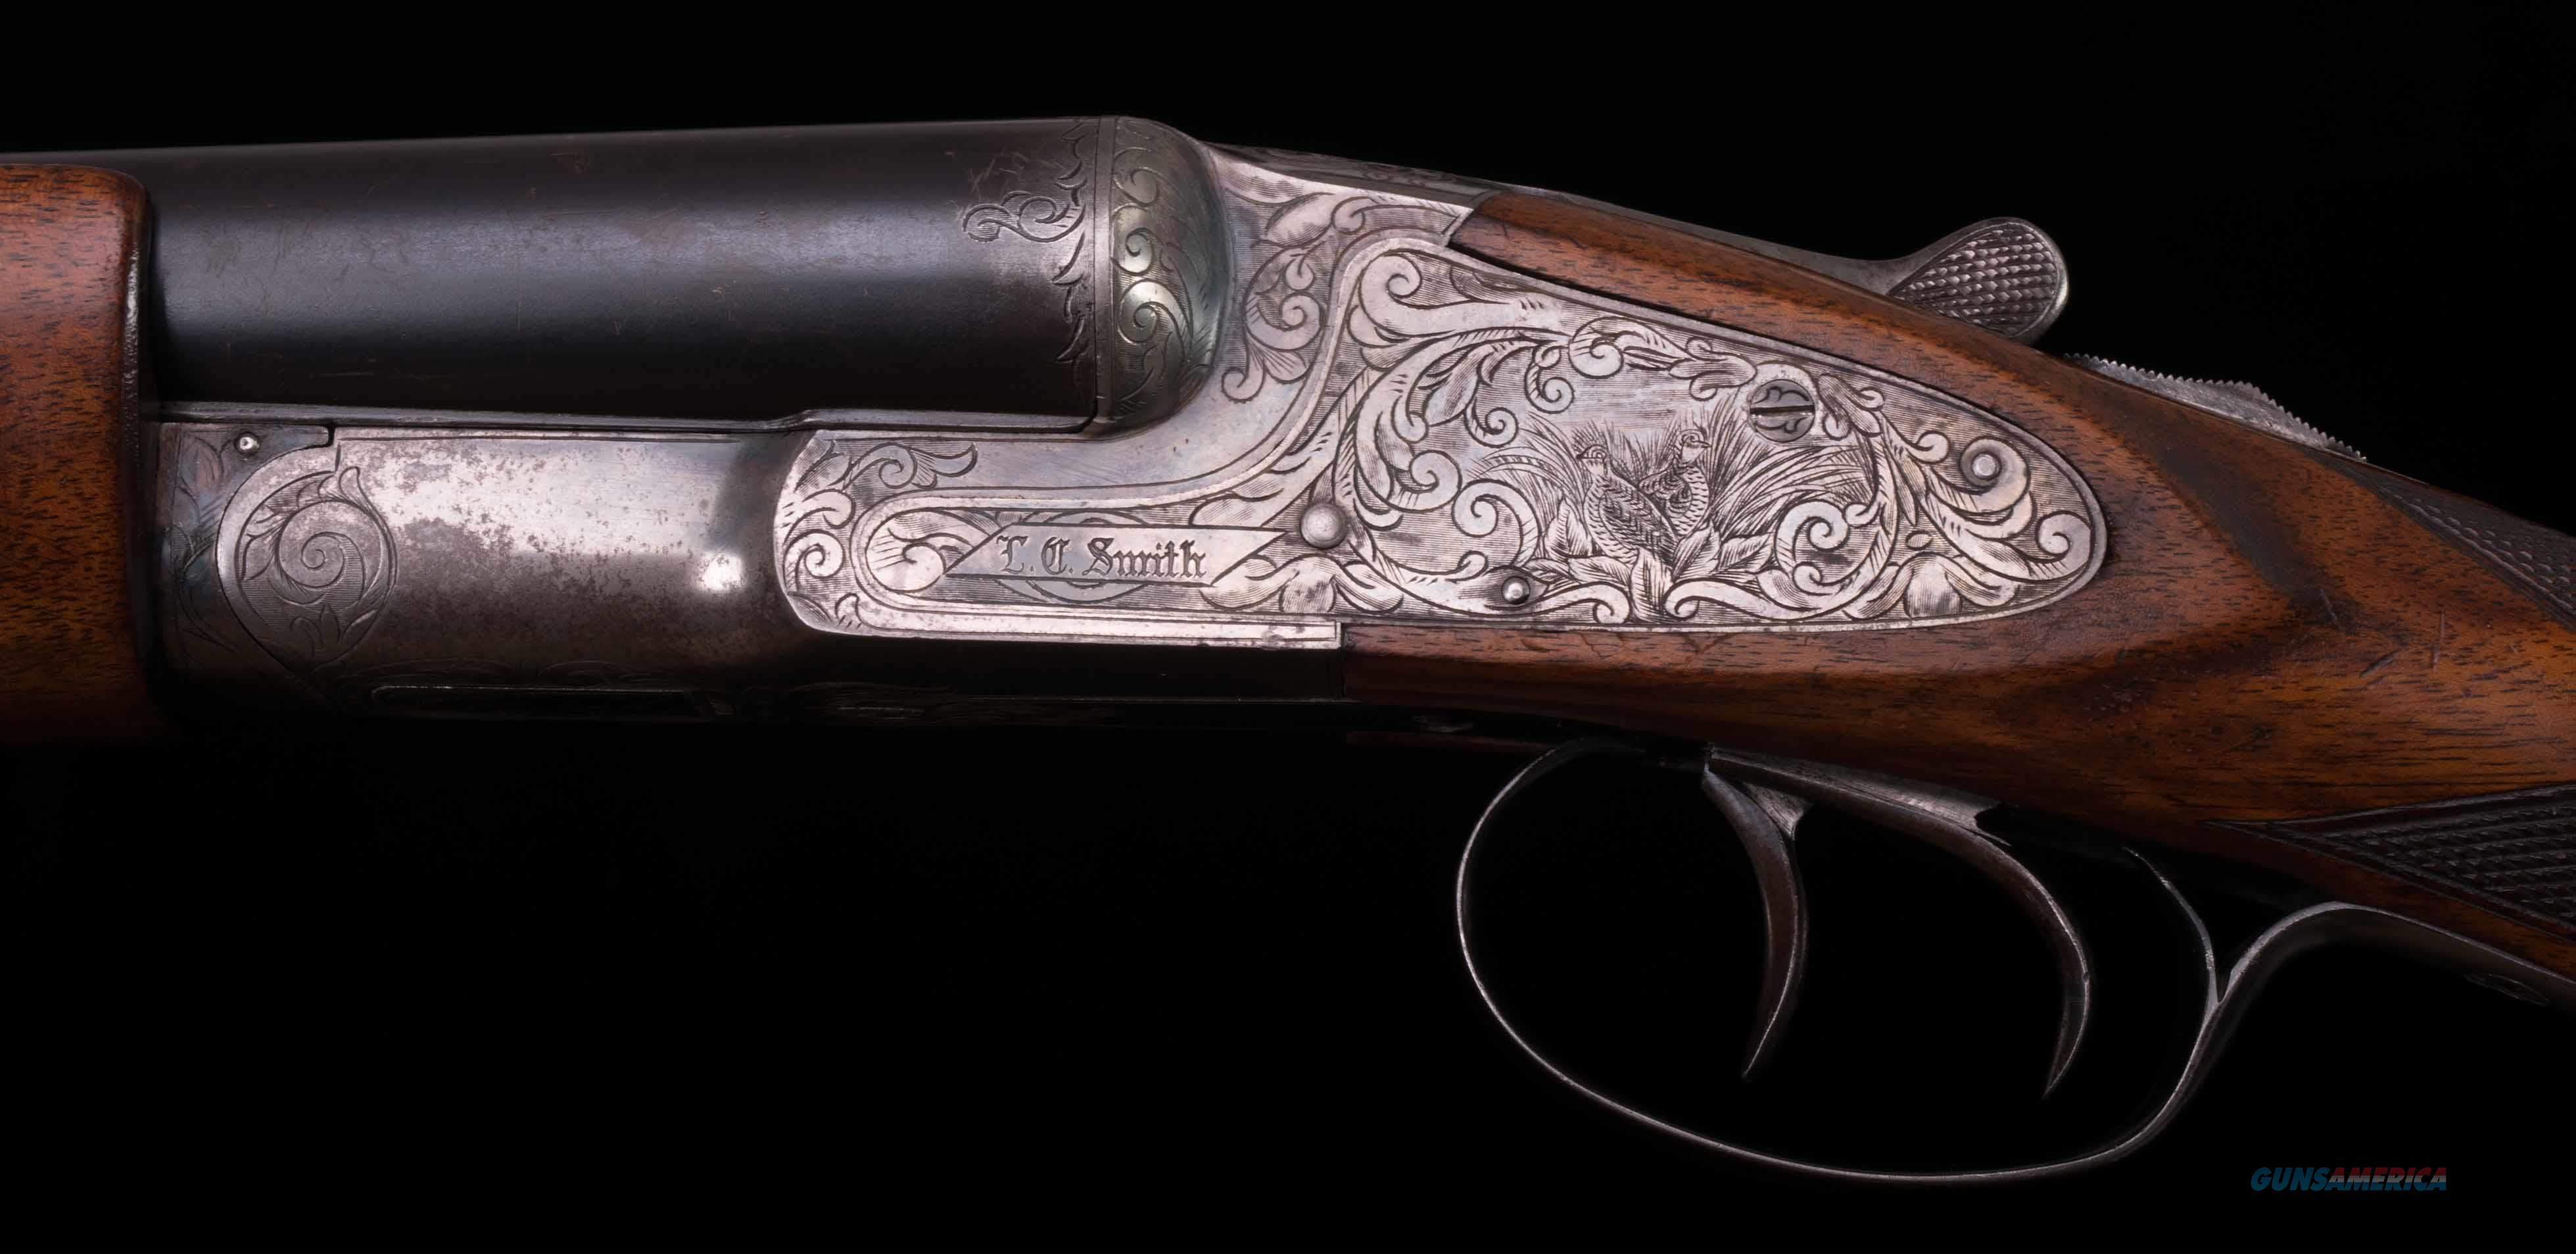 "L.C. Smith Specialty 12 Gauge – 32"" BARRELS, ENGLISH STOCK, BEAVERTAIL, vintage firearms inc   Guns > Shotguns > L.C. Smith Shotguns"